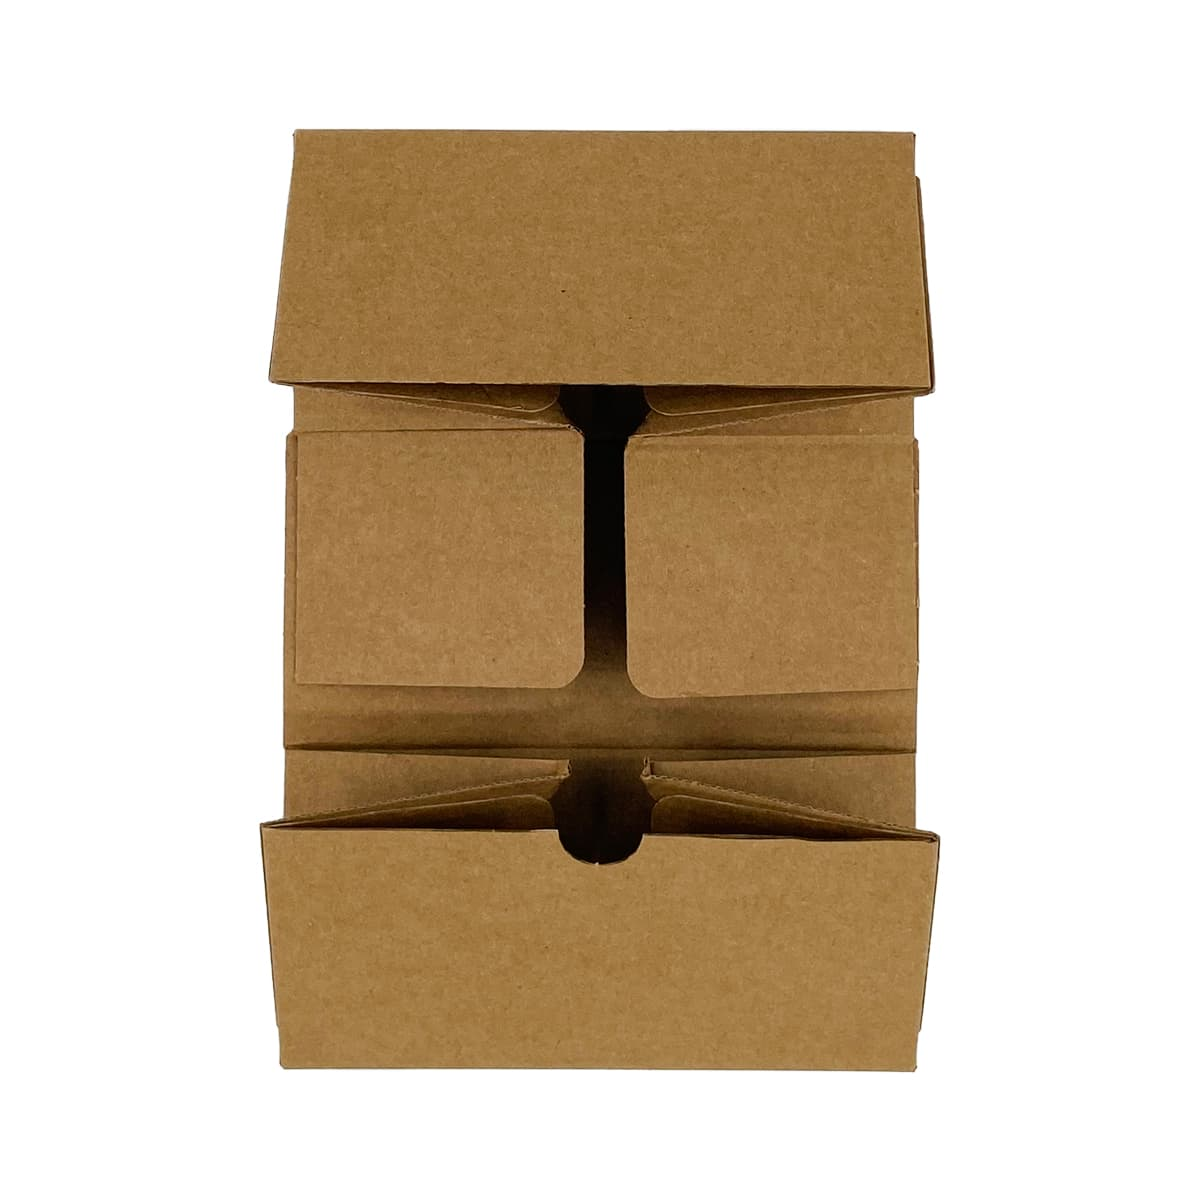 Kilitli Kargo Kutuları